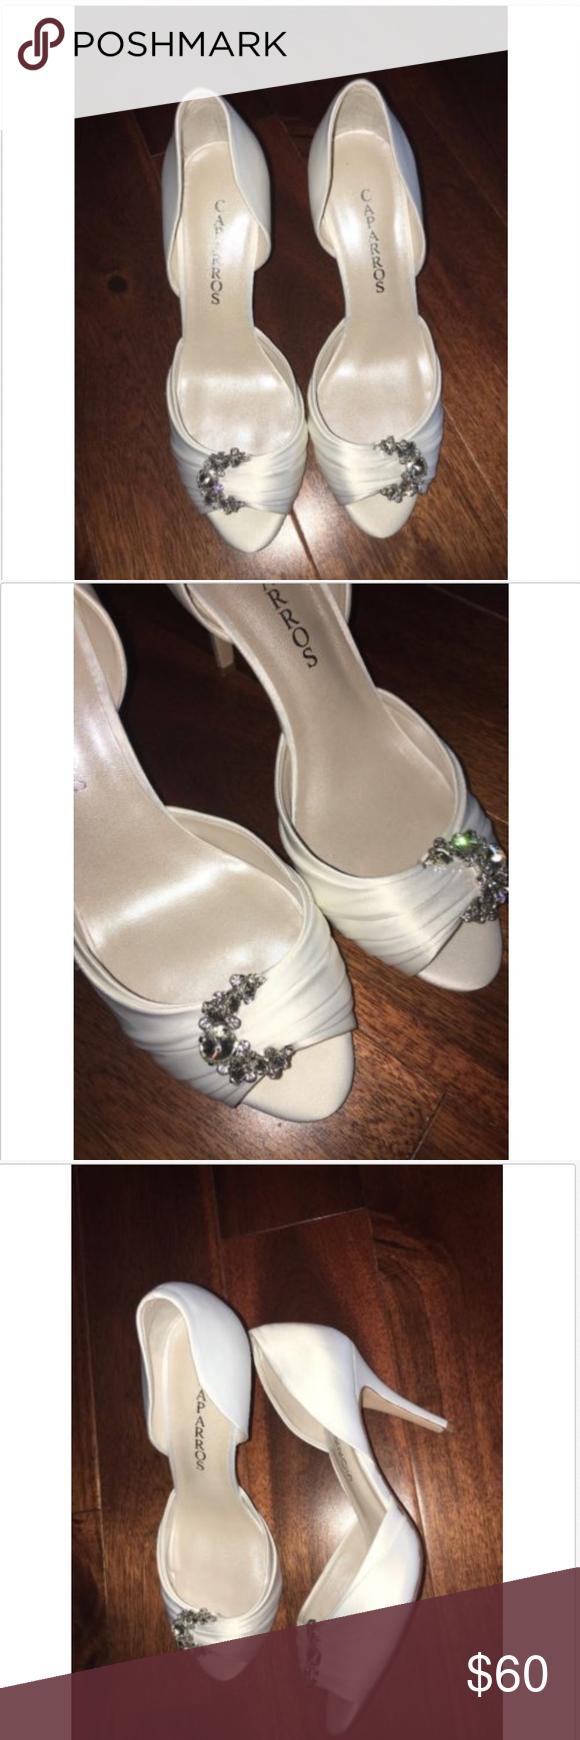 438a5a6f8bf Caparros Bridal Shoe Size 9 Peep Toe NWT Caparros Bridal Shoe Size 9 Peep  Toe Crystal